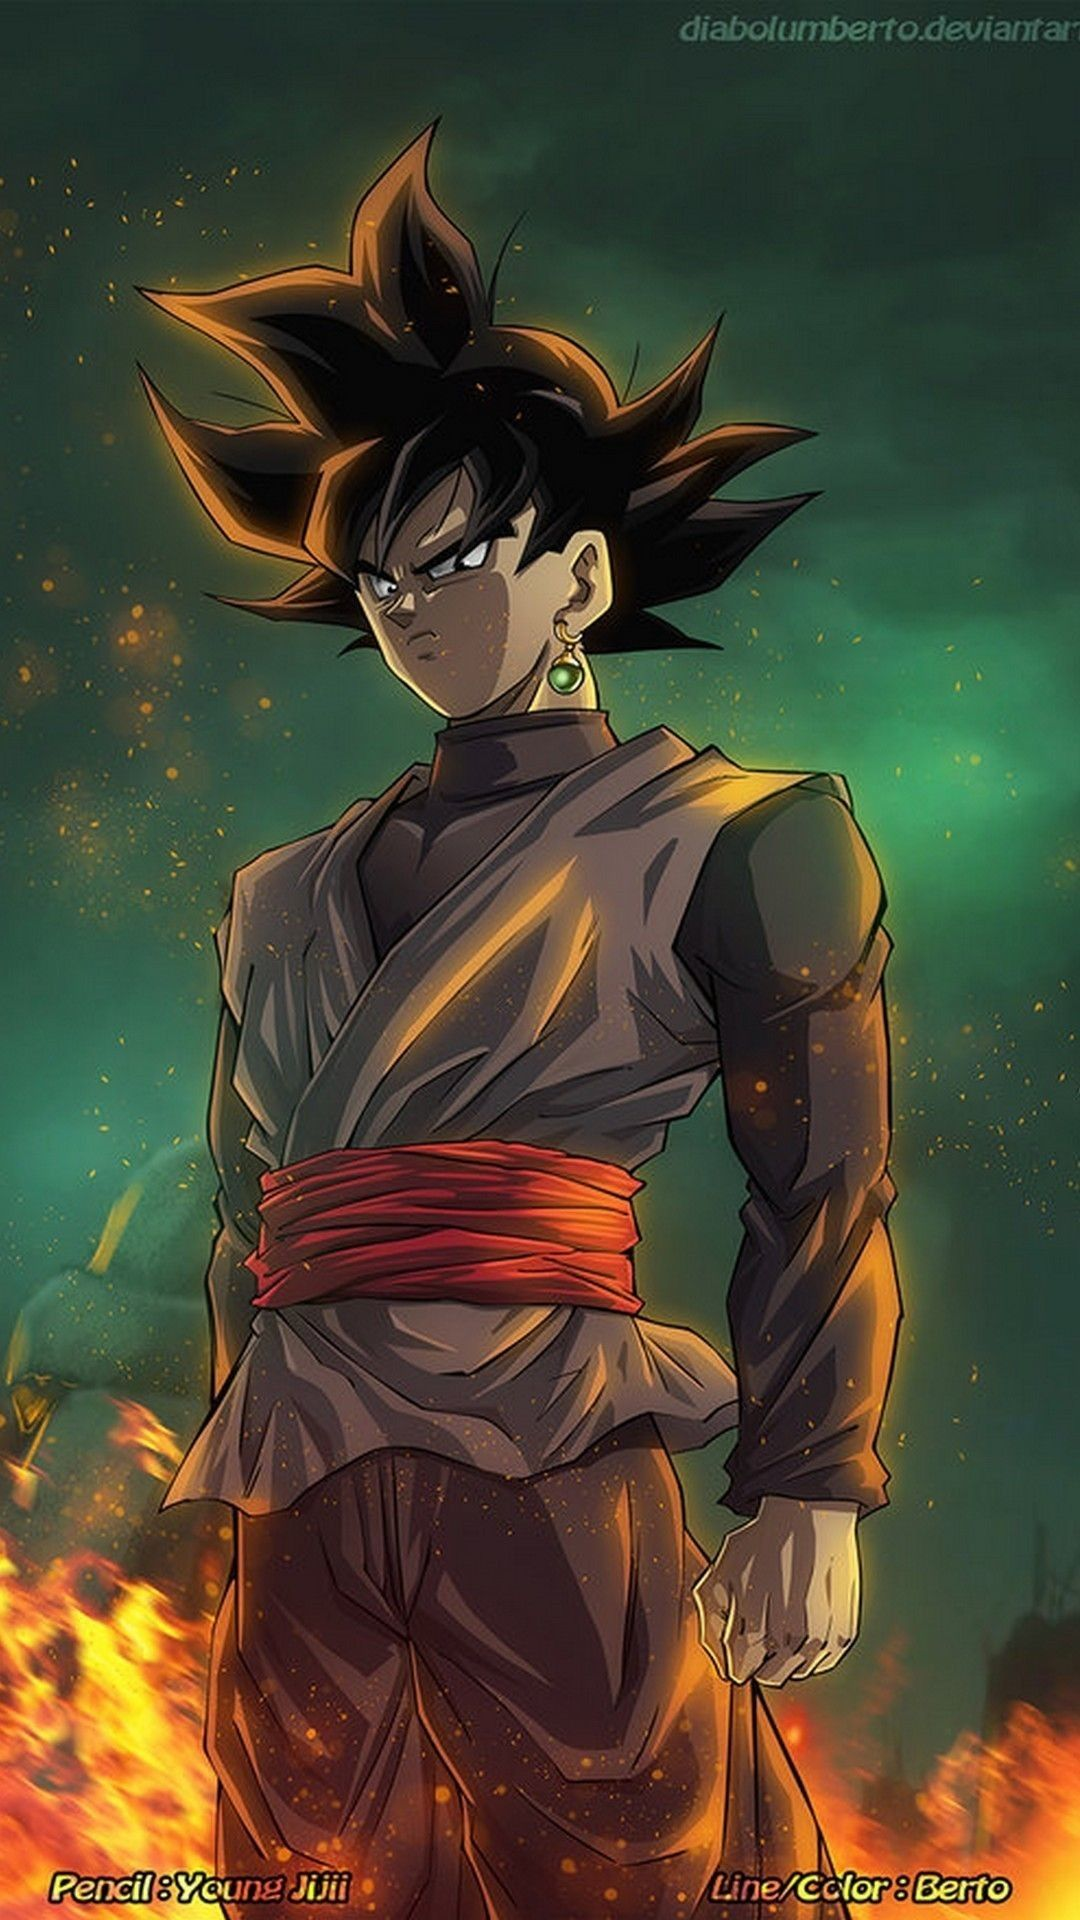 Black Goku 3d Wallpaper Hd Ultra 4k In 2020 Anime Dragon Ball Super Dragon Ball Super Manga Dragon Ball Wallpapers